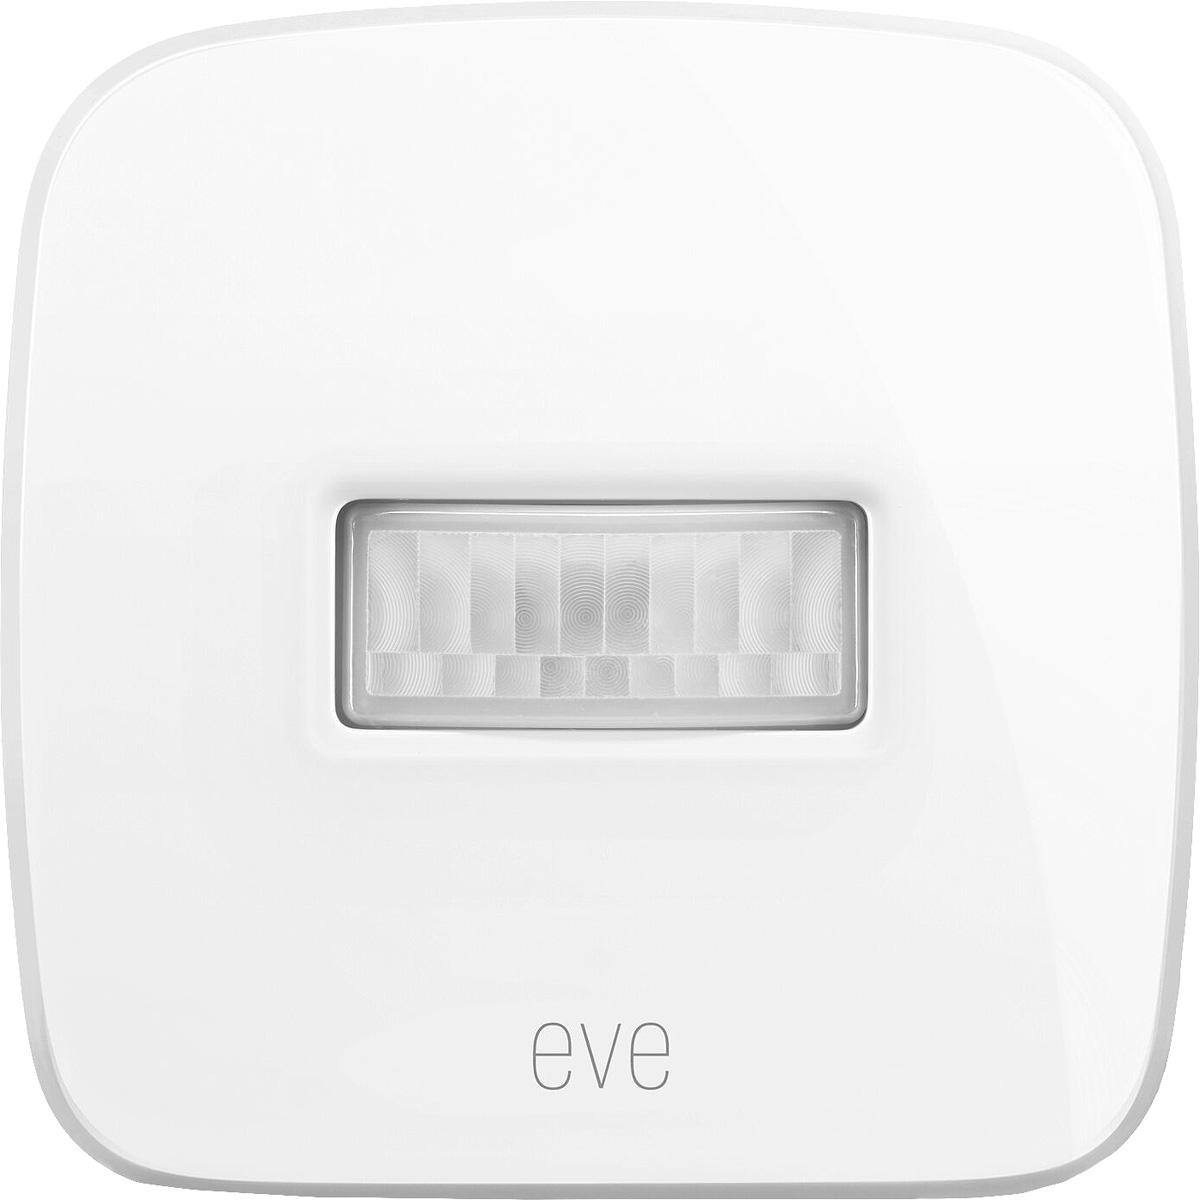 Elgato Eve Motion датчик движения контроллер elgato eve motion 1em109901000